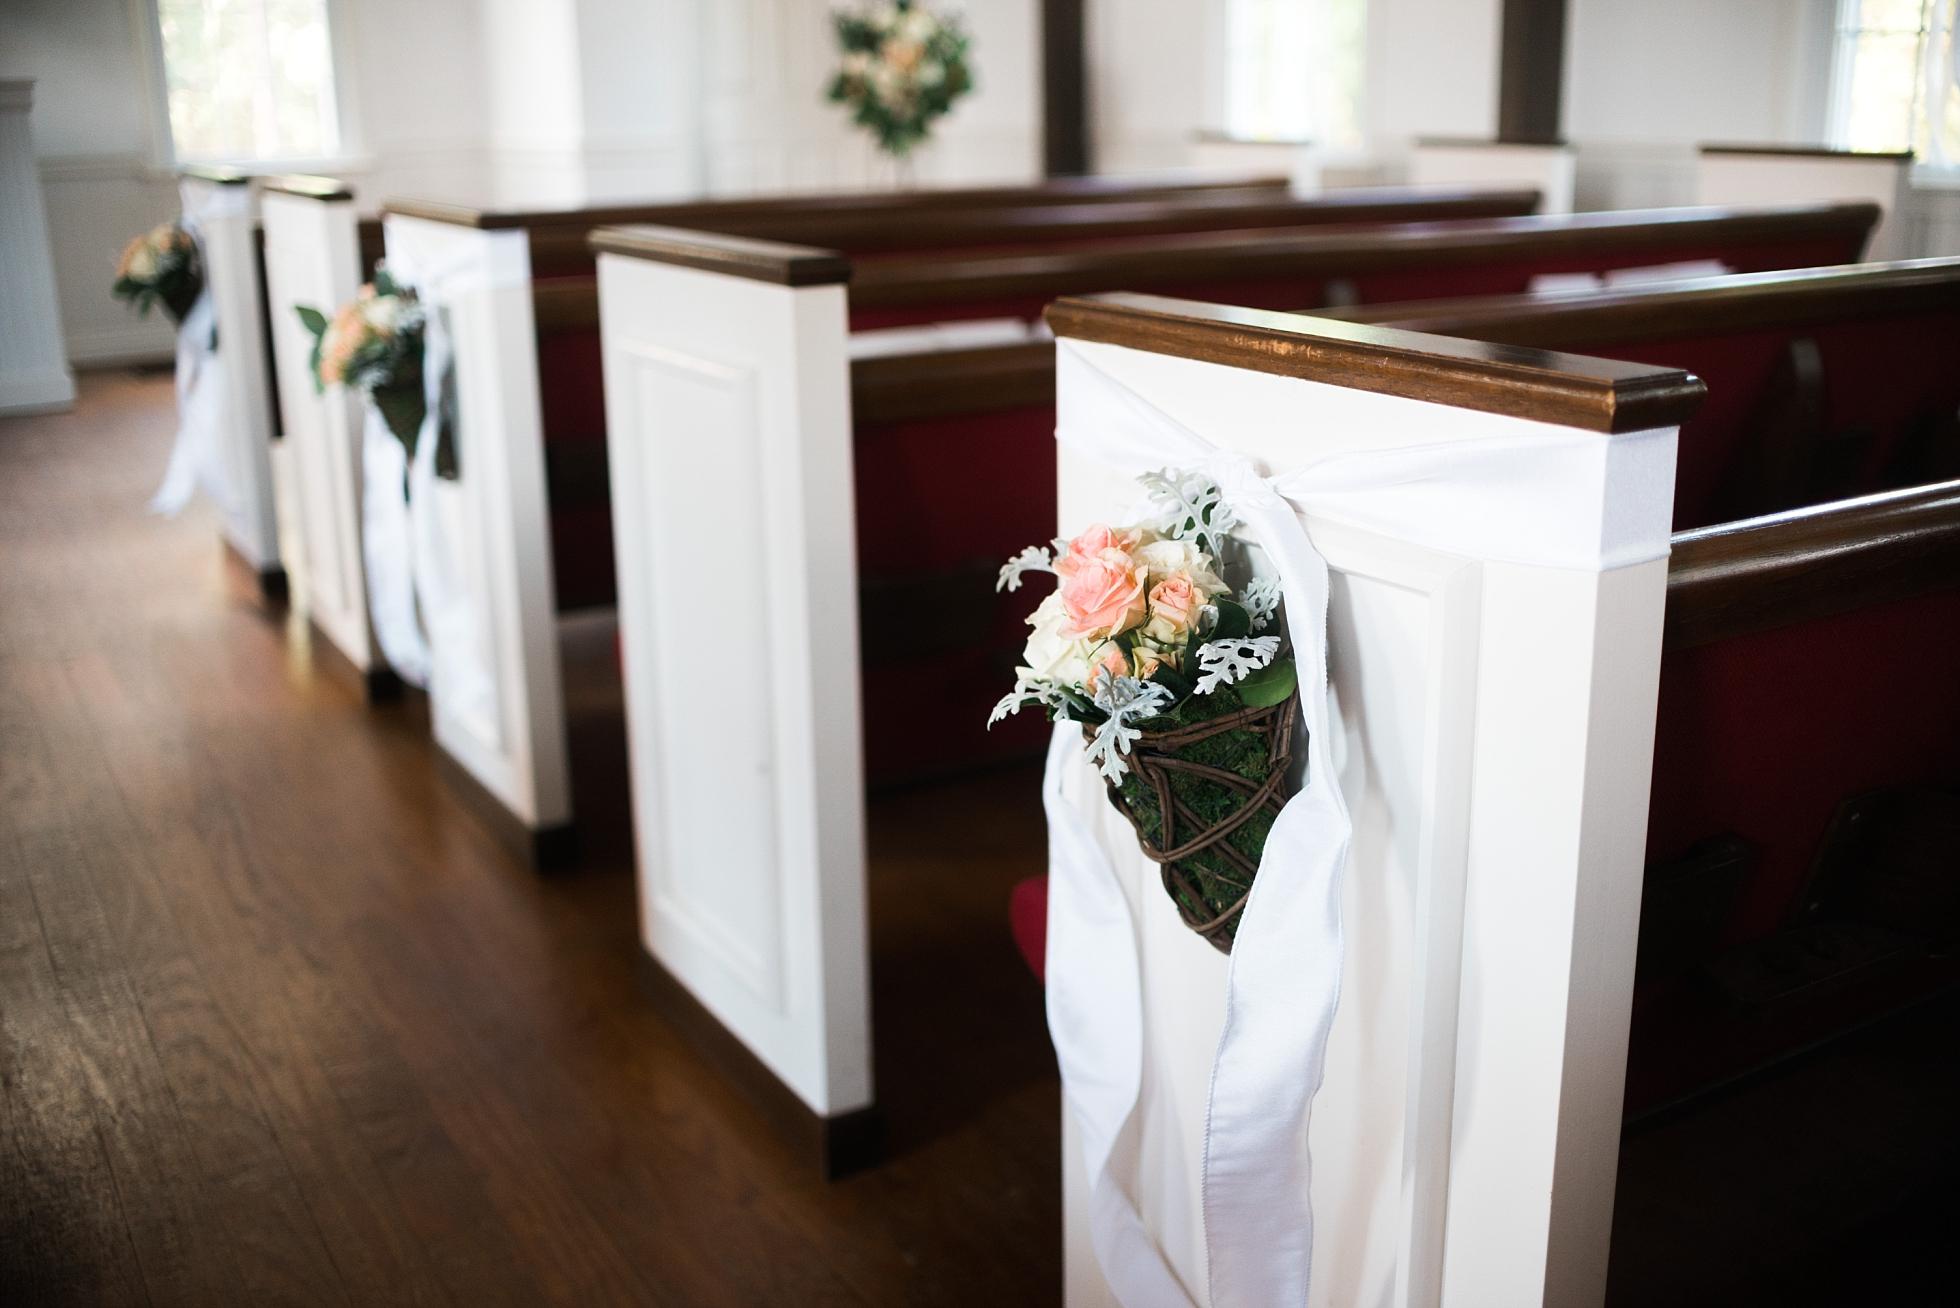 Pew Decor | Kyle & Erin | Scarbrough Wedding | Children's Harbor | Laura Wilkerson Photography